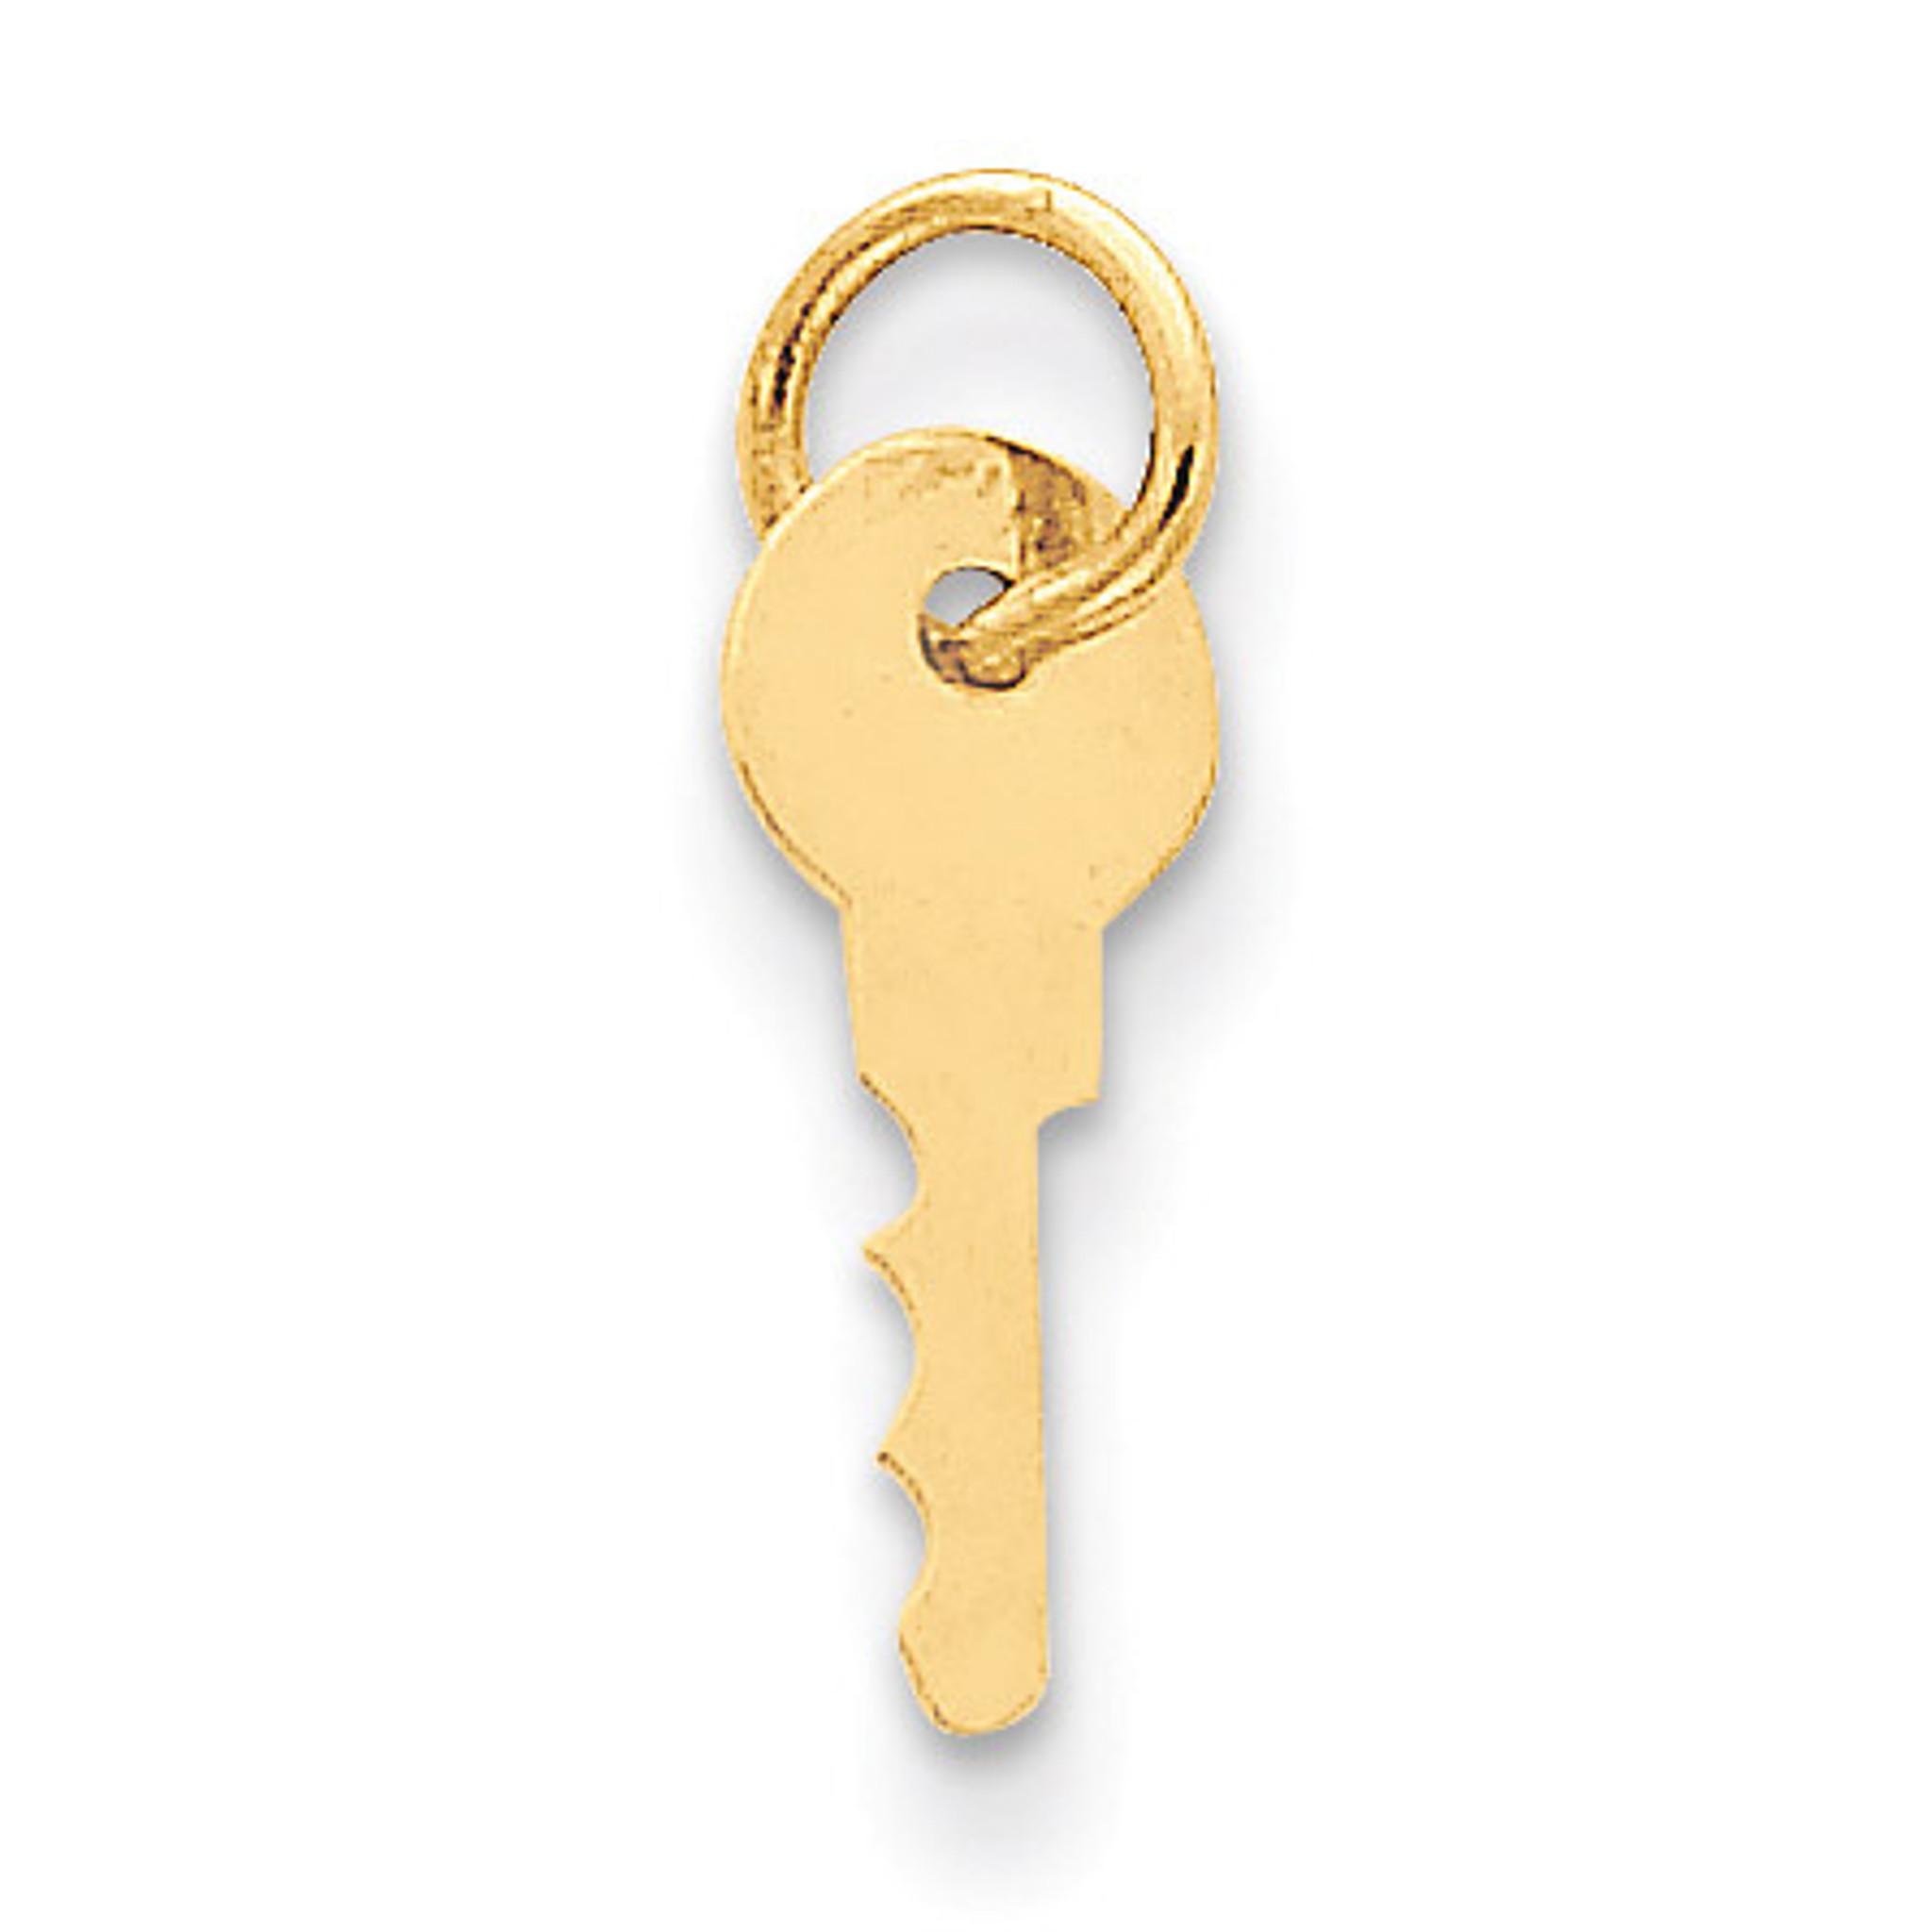 Solid 14k Yellow Gold C Key Charm Pendant 19mm x 4mm